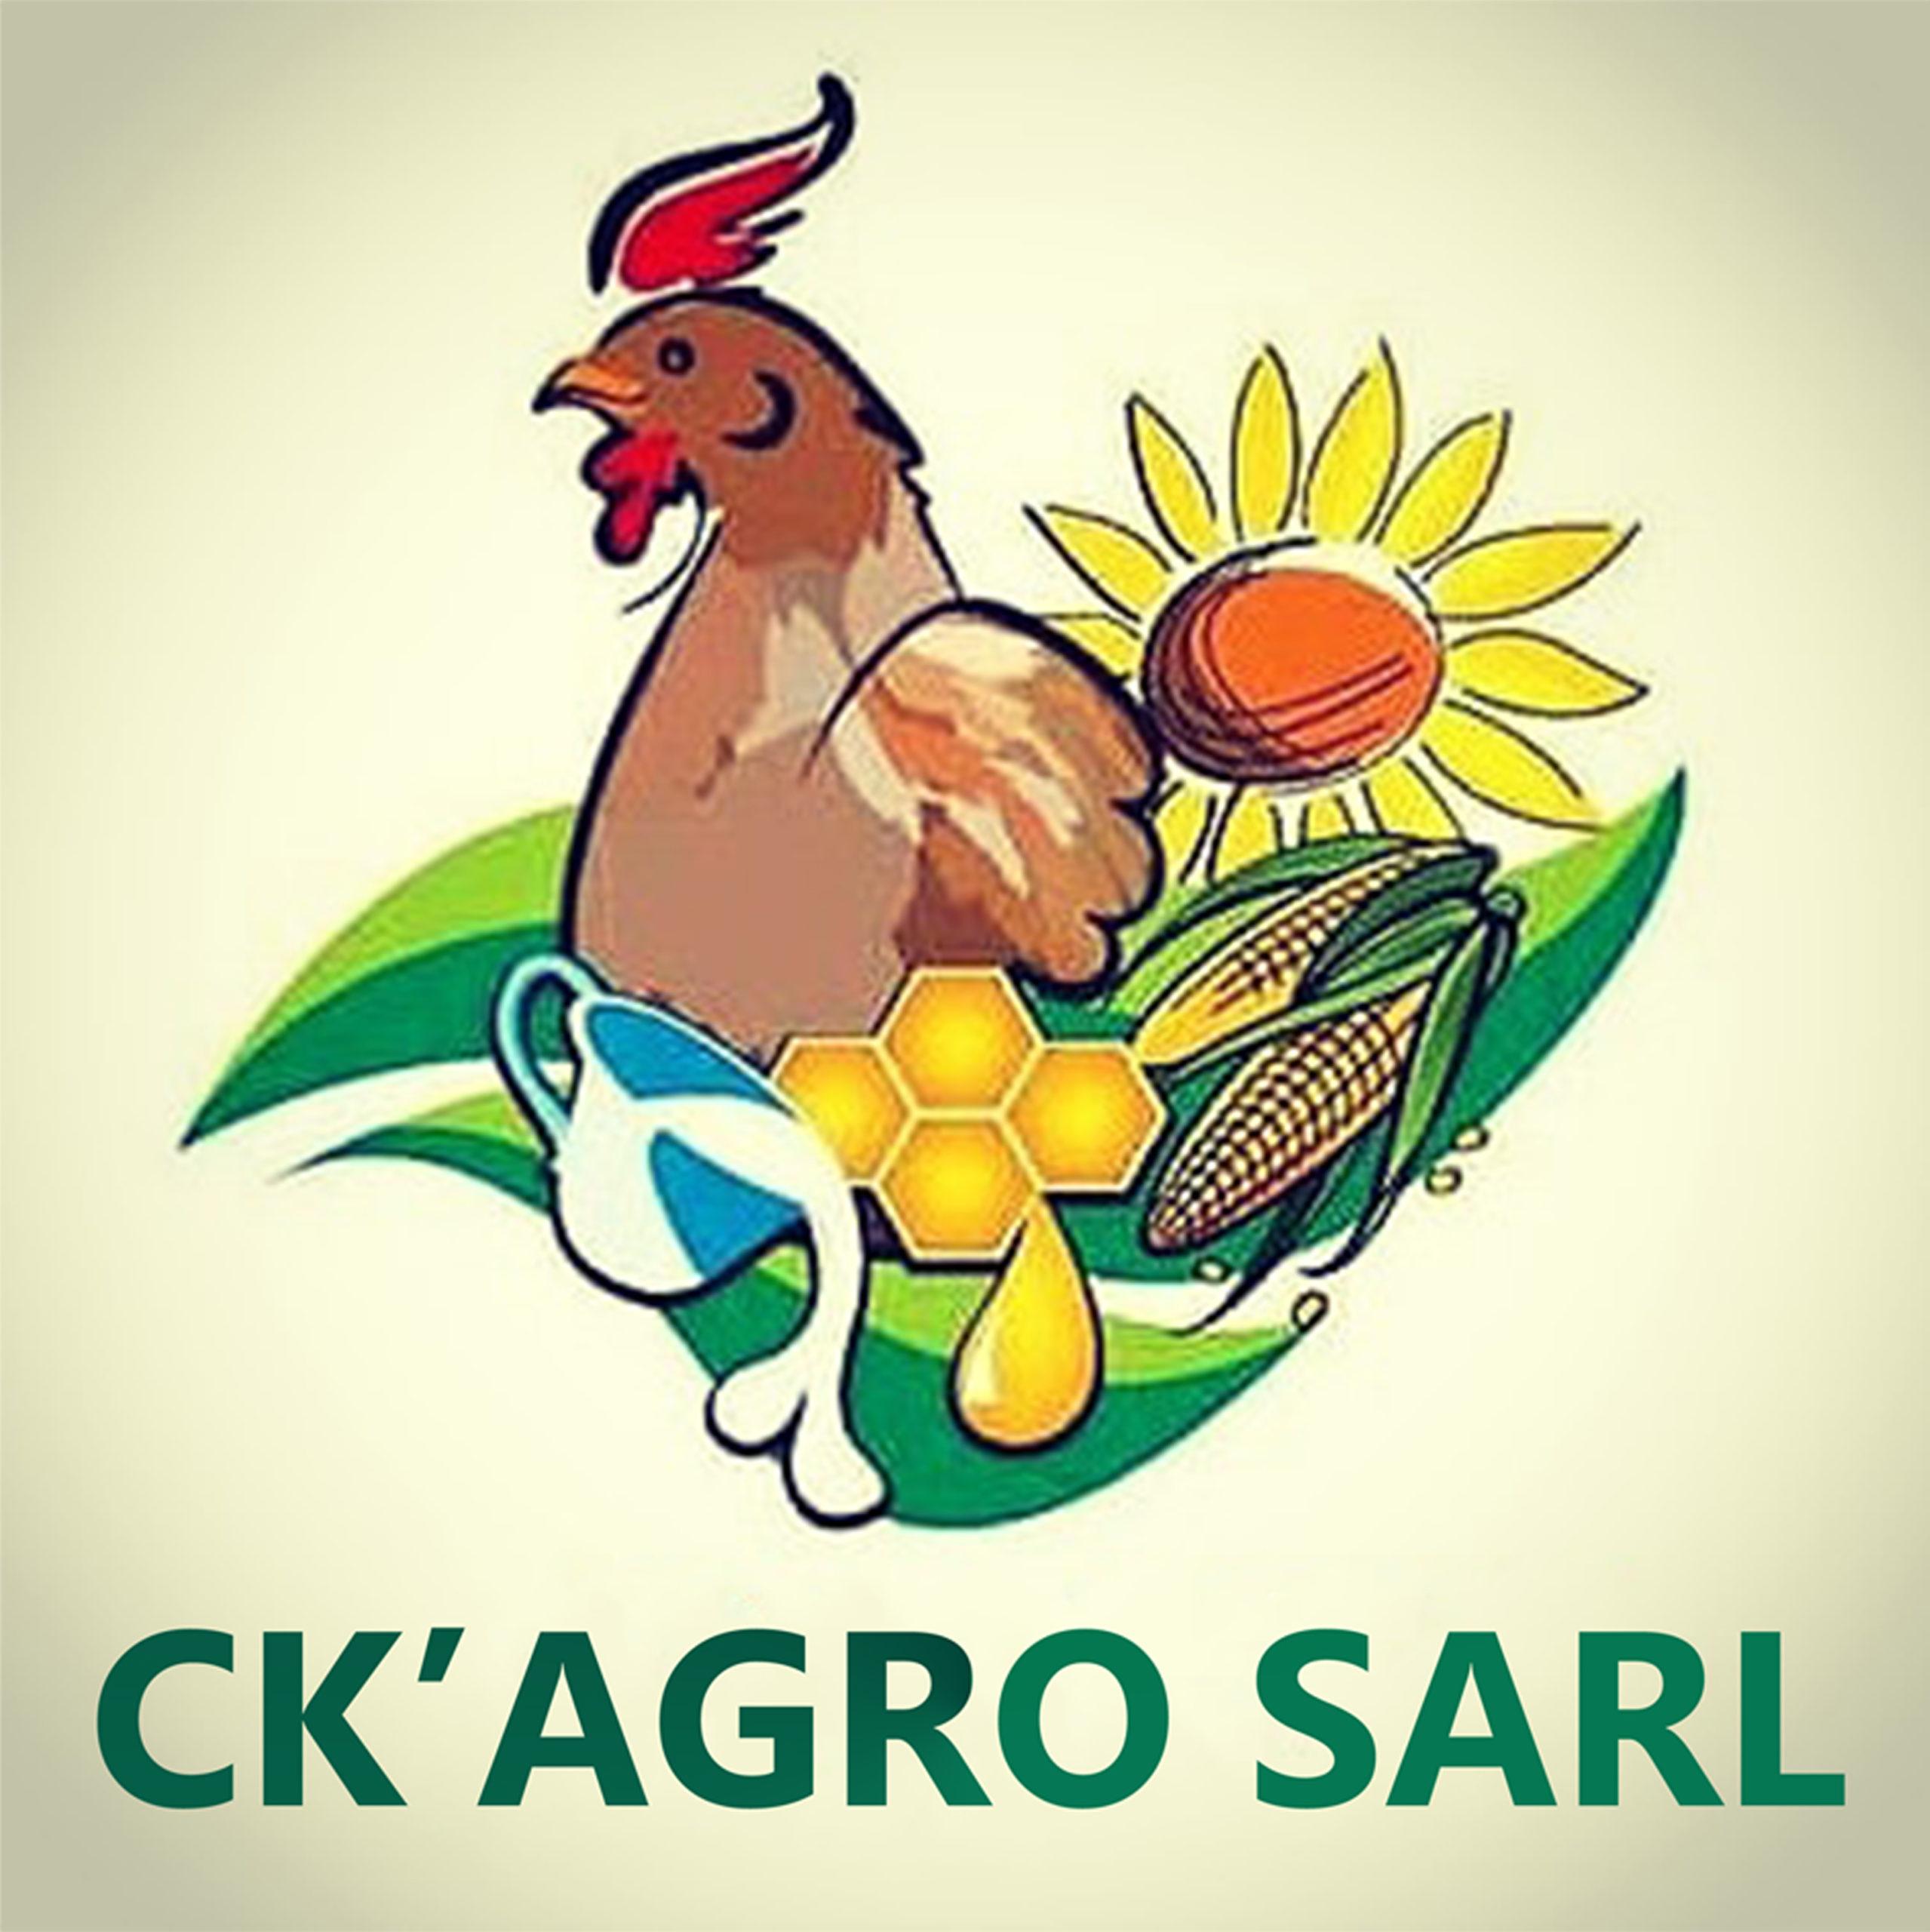 LOGO CK'agro